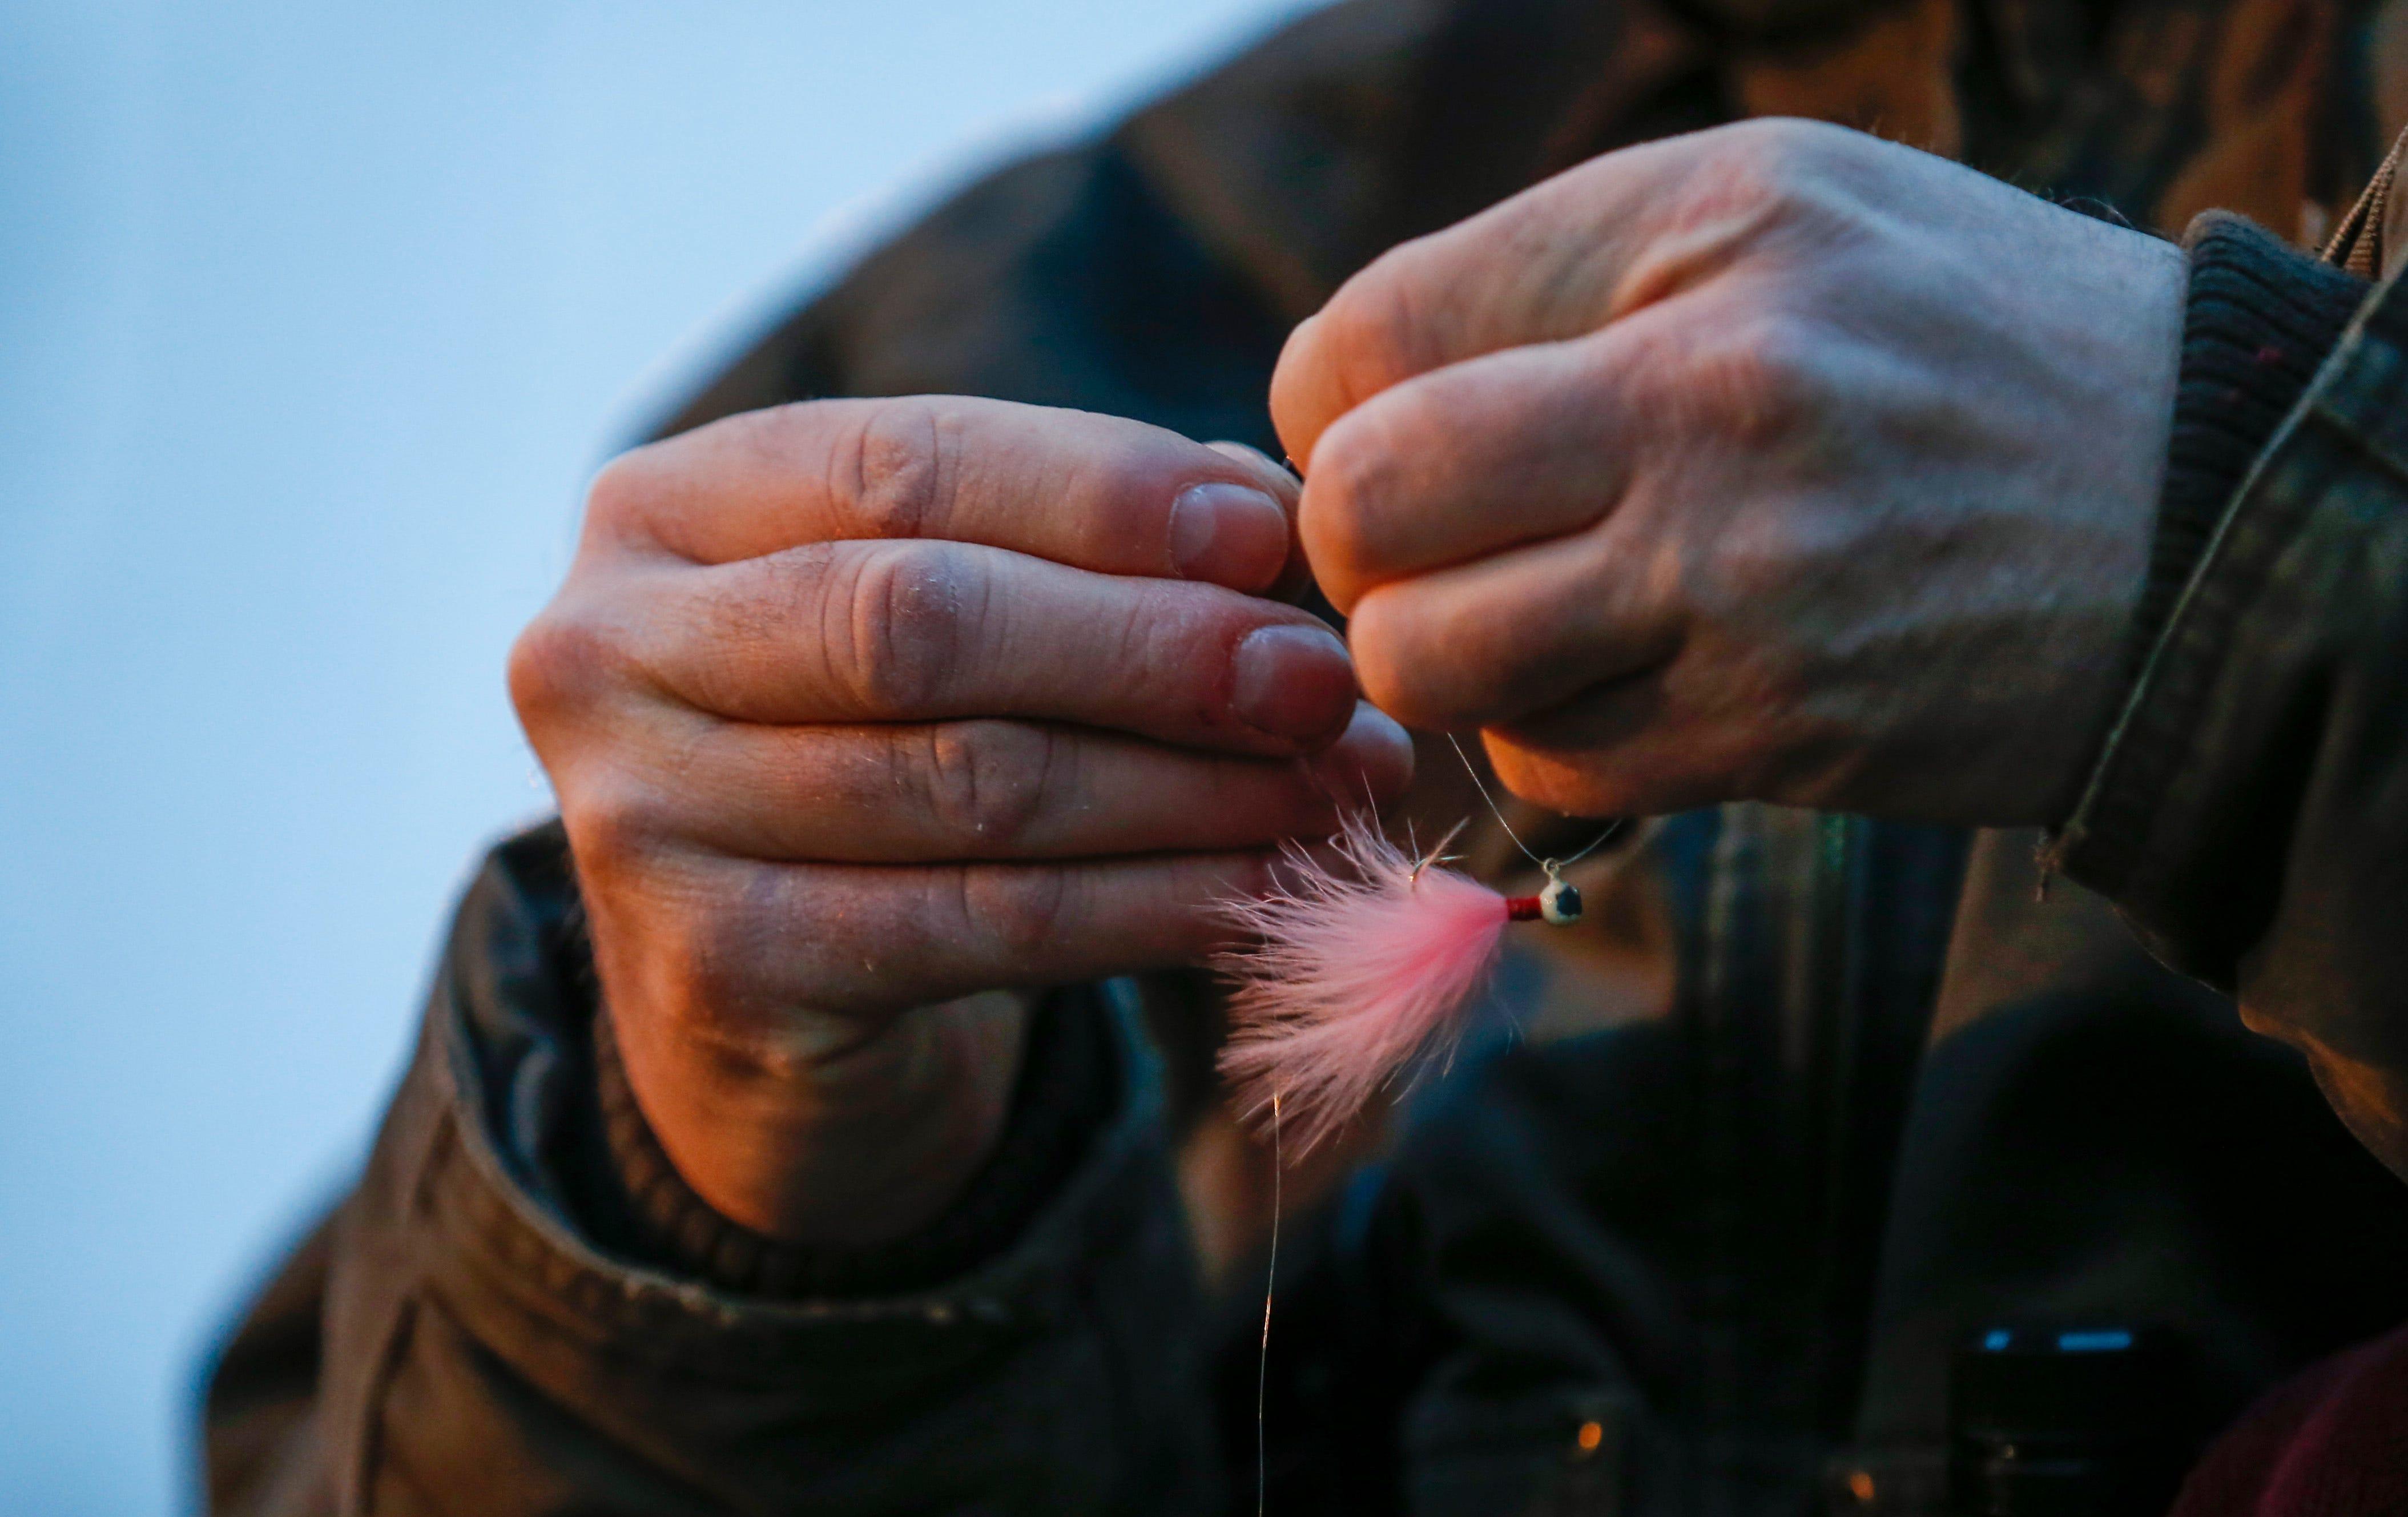 Colby jansen nails zach hunter